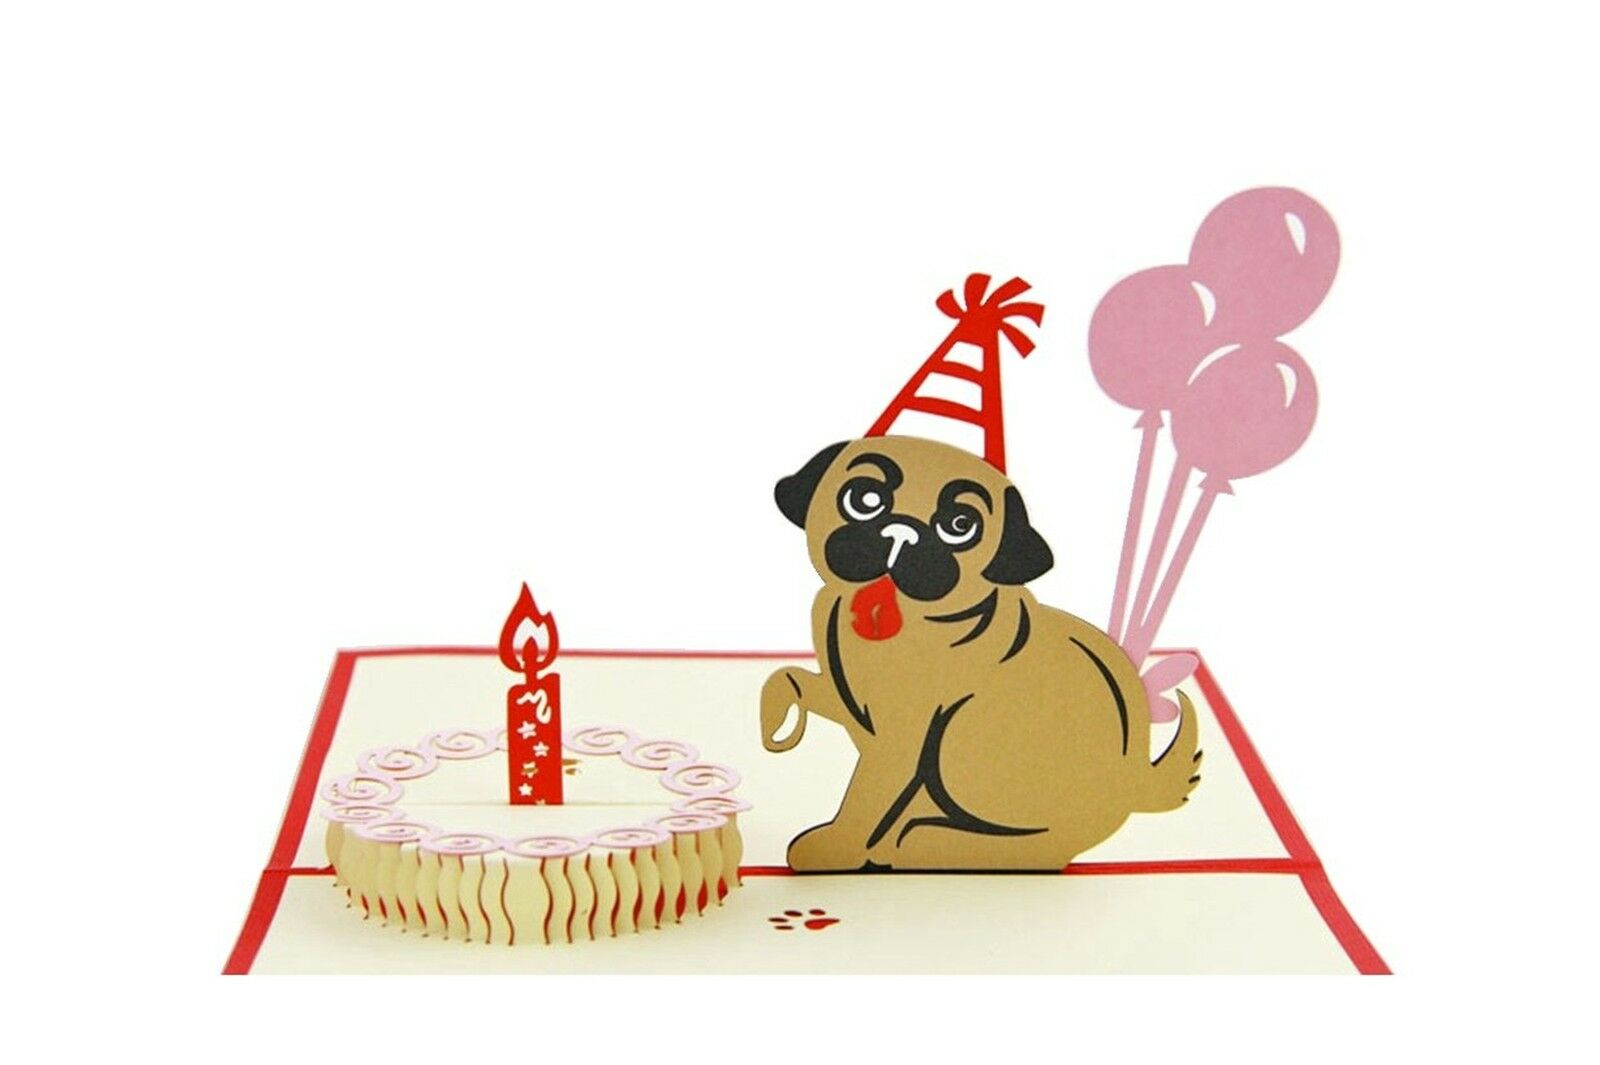 Isharecards Handmade 3d Pop Up Childrens Birthday Cards Dog House Ebay